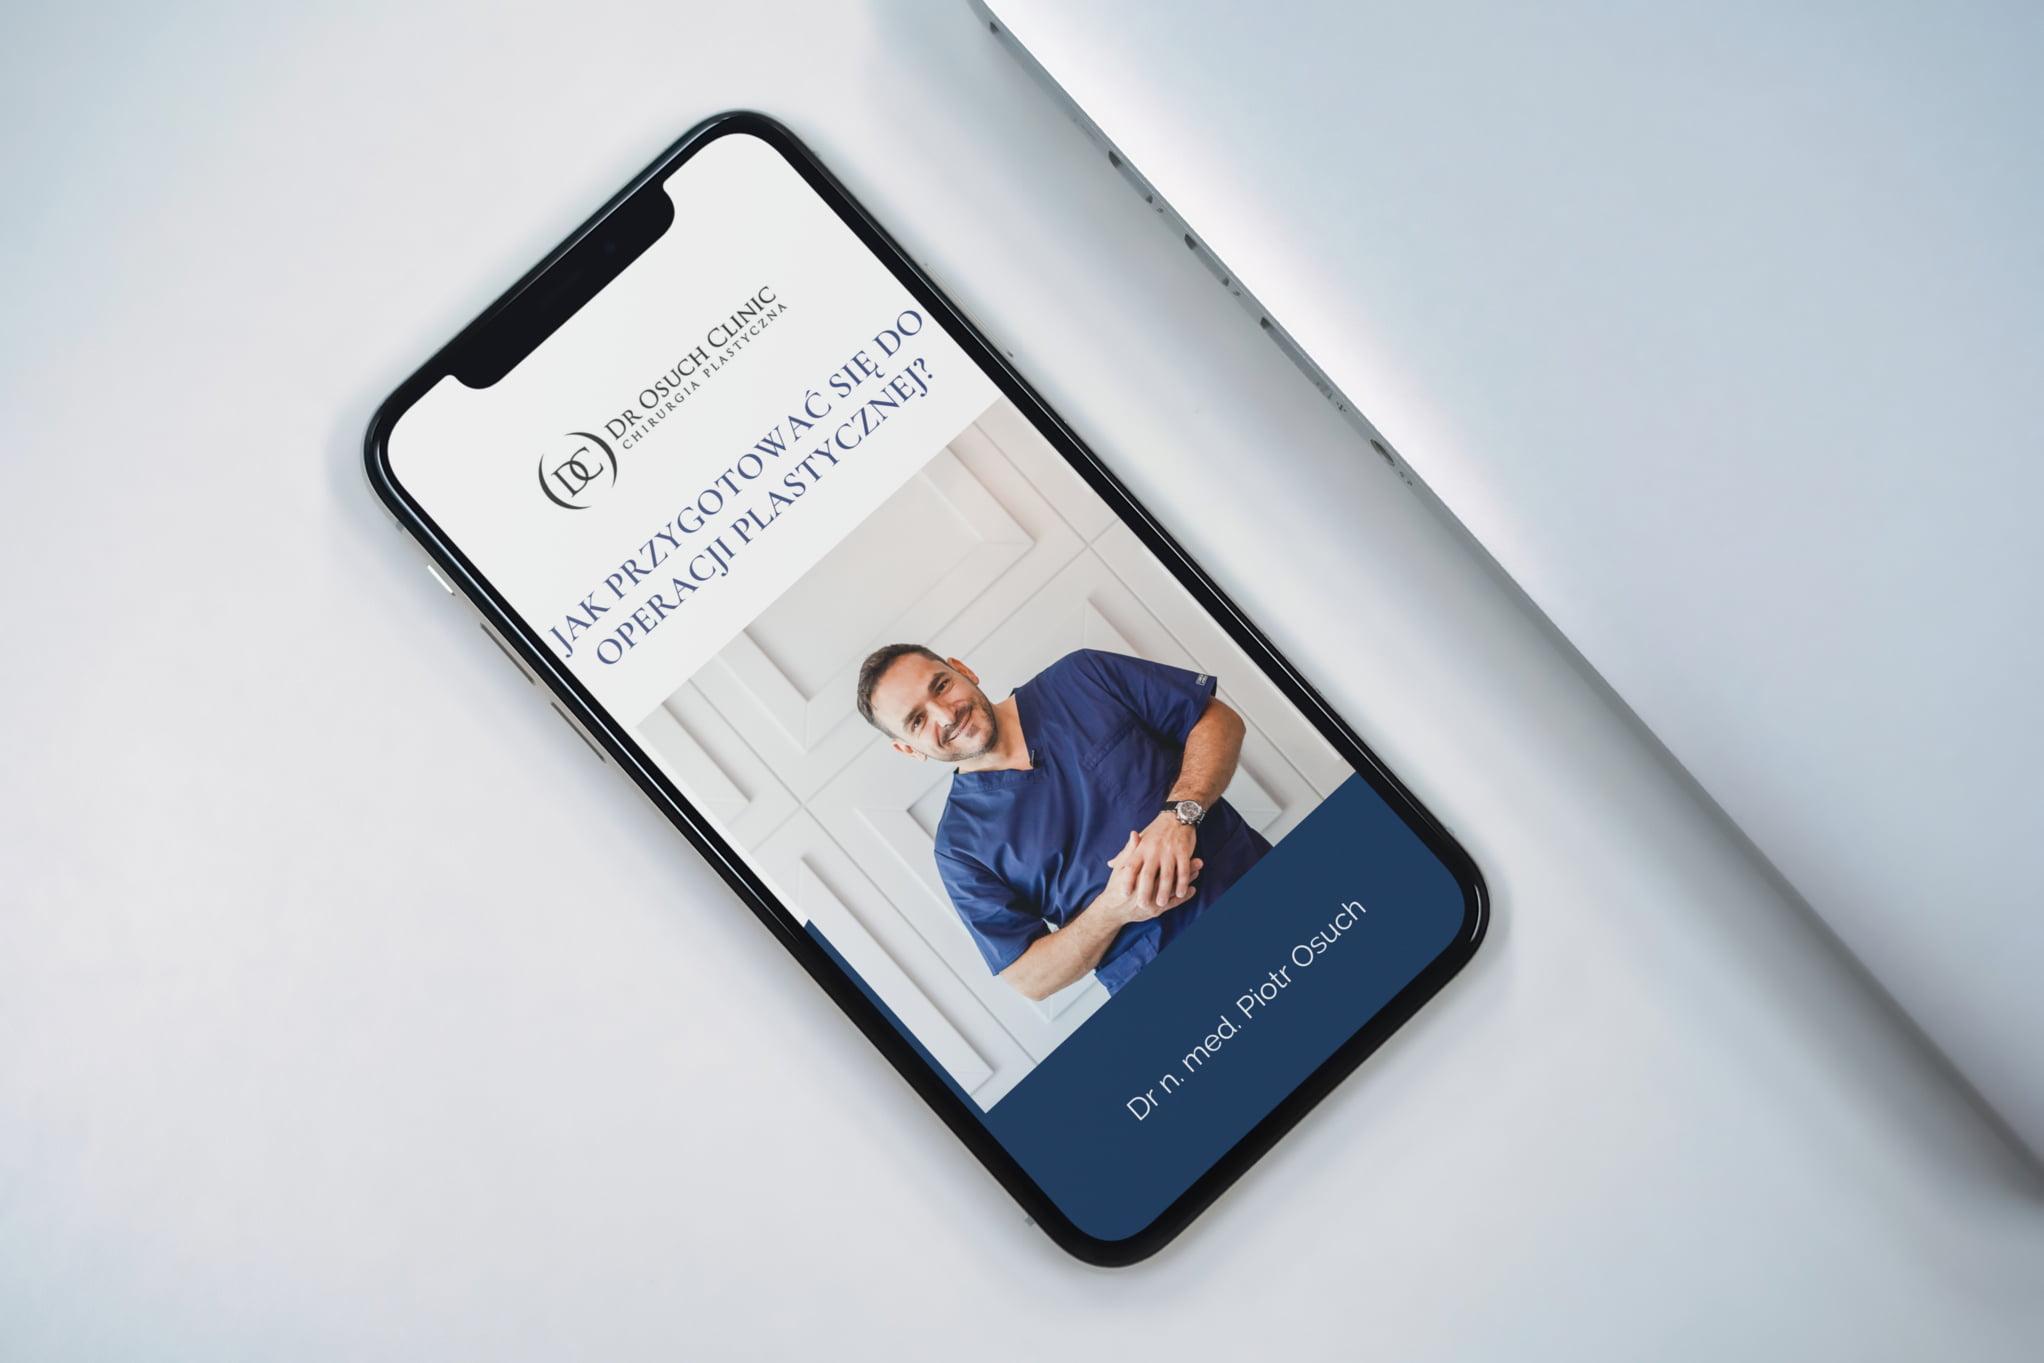 Dr Piotr Osuch e-book